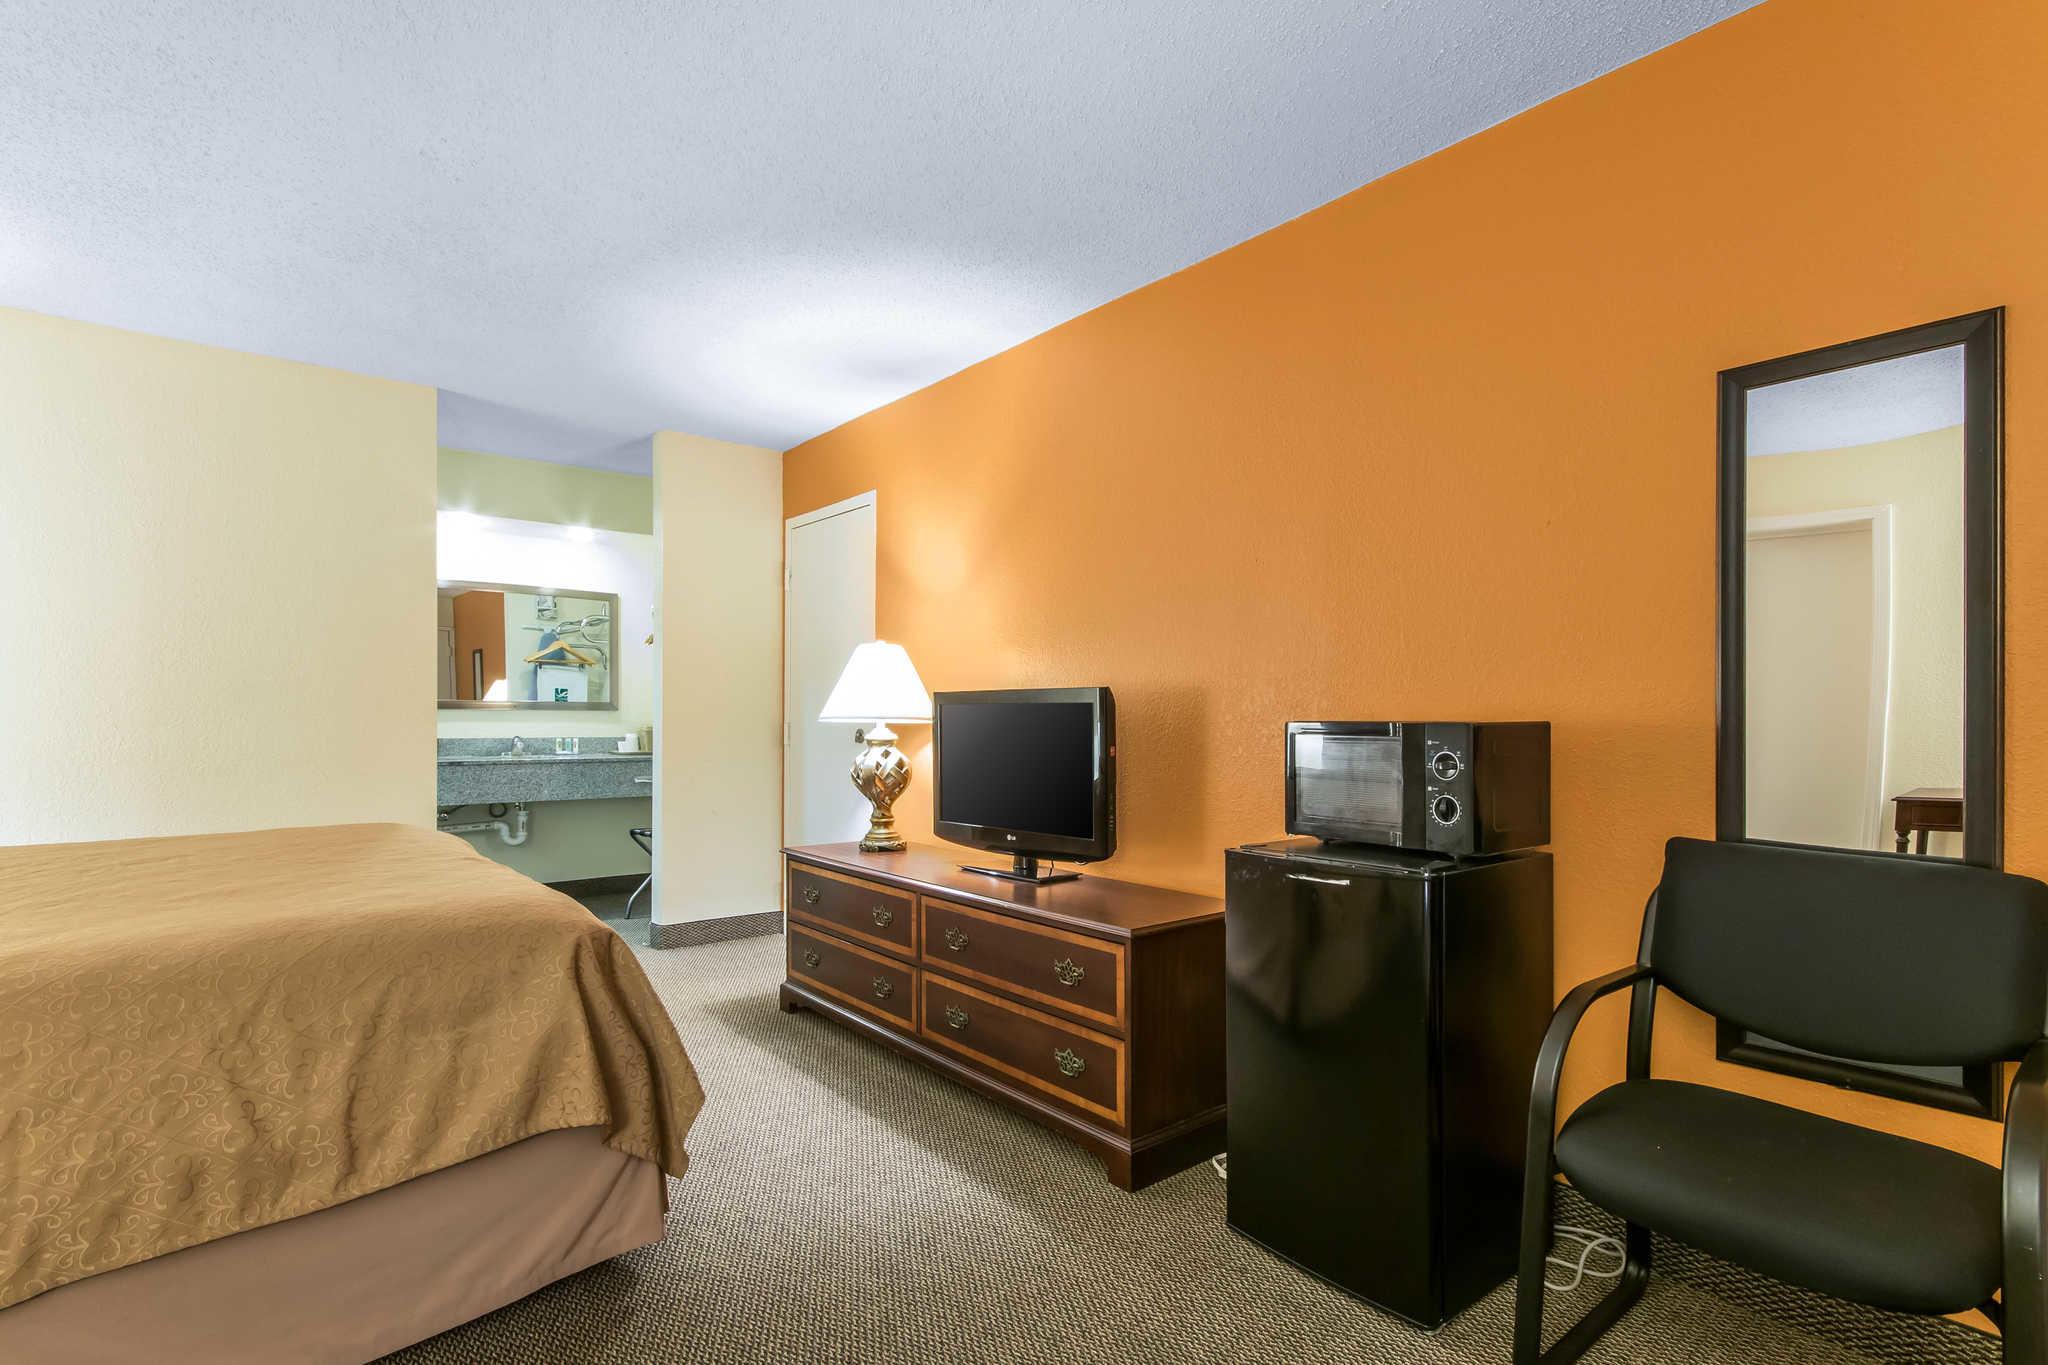 Quality Inn - Closed image 9